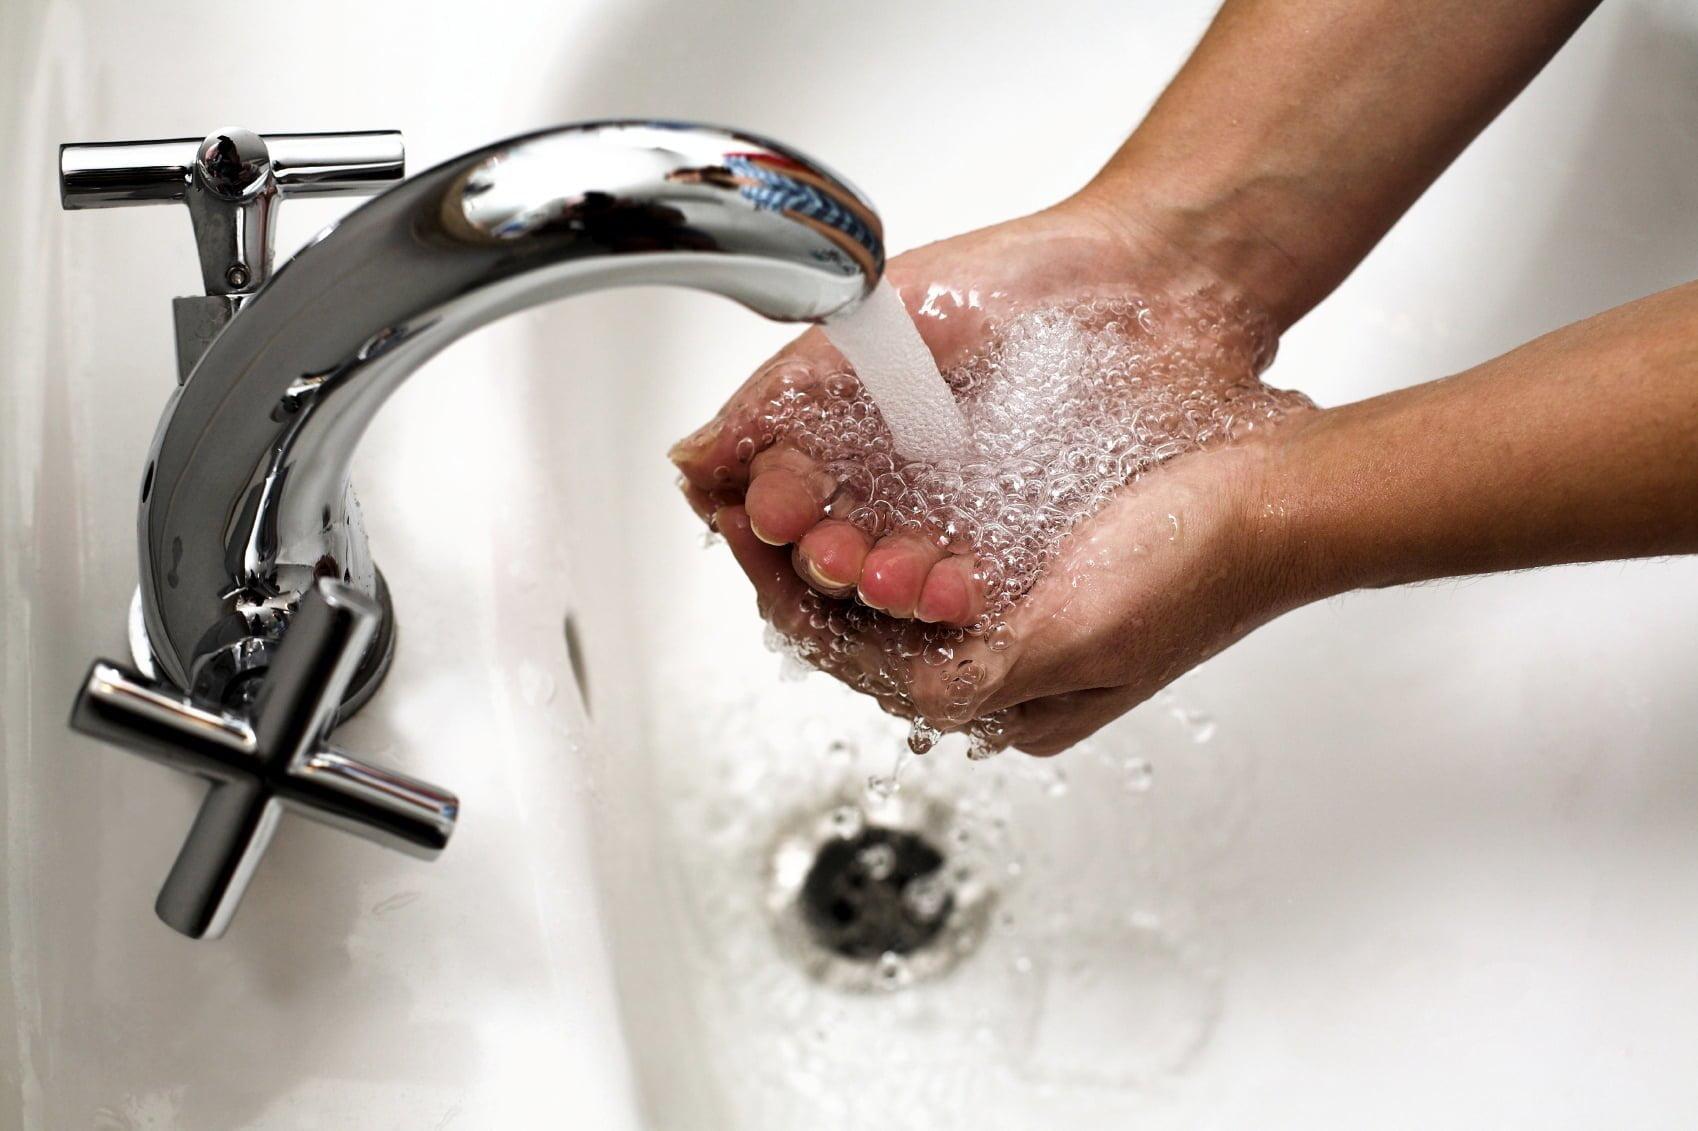 håndhygiene